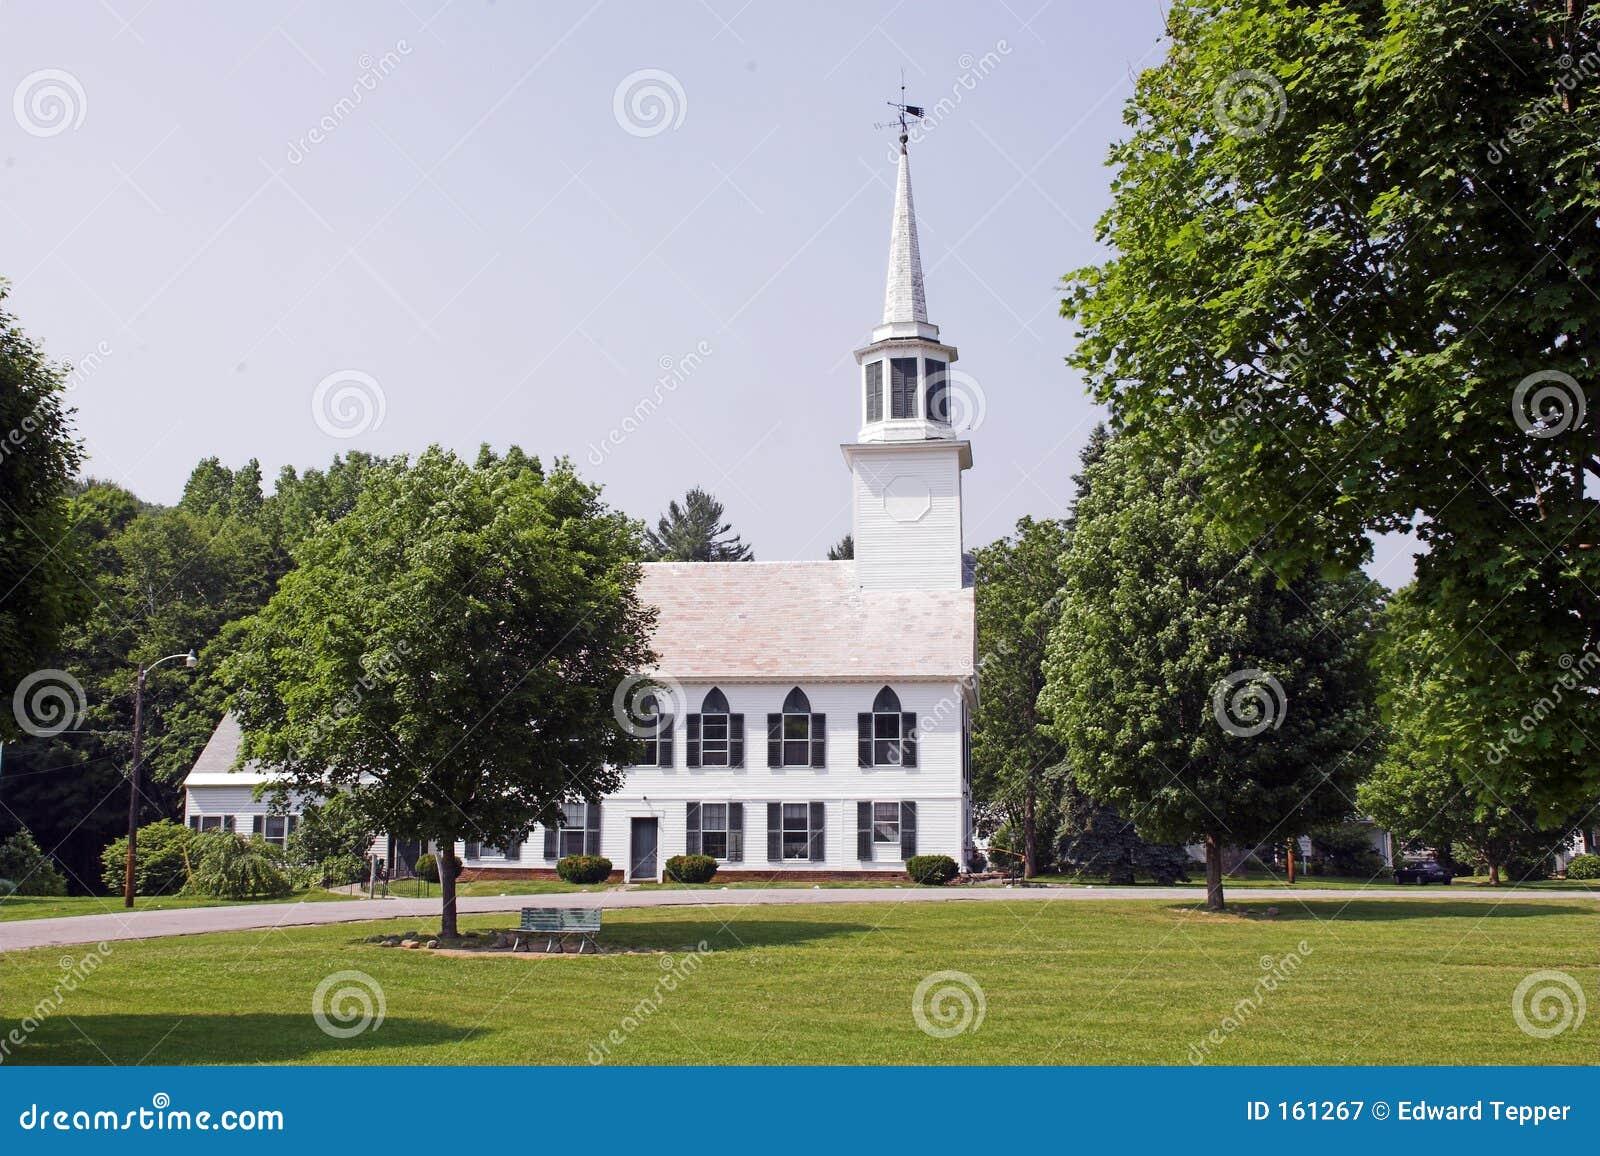 Church in Park